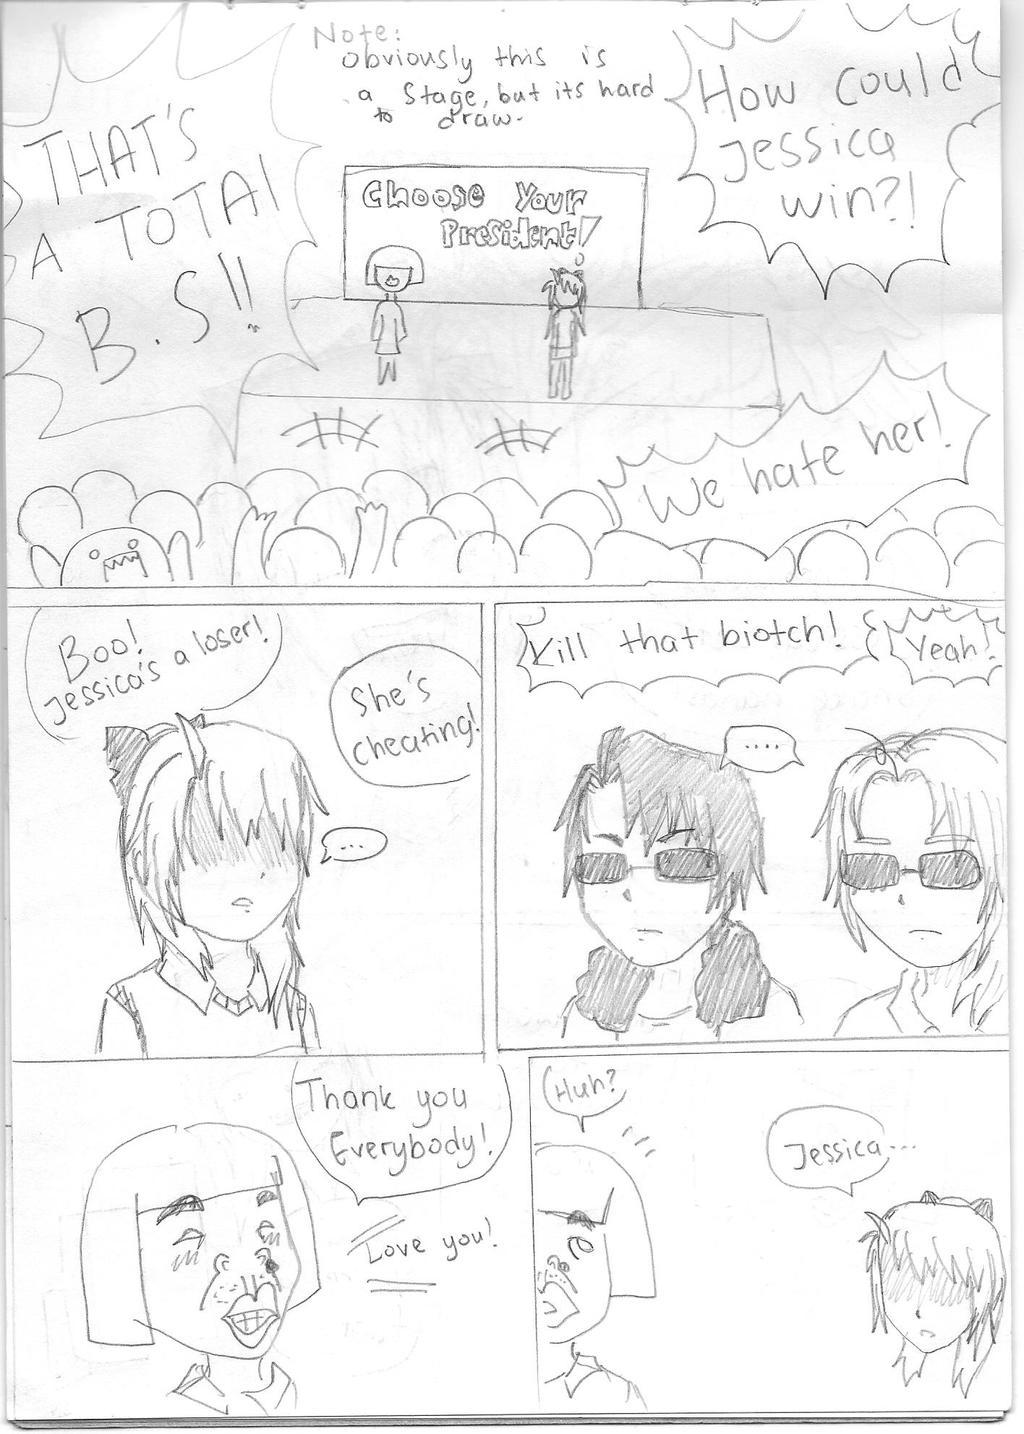 2p america x reader page 20 by mangakafan98 on deviantart